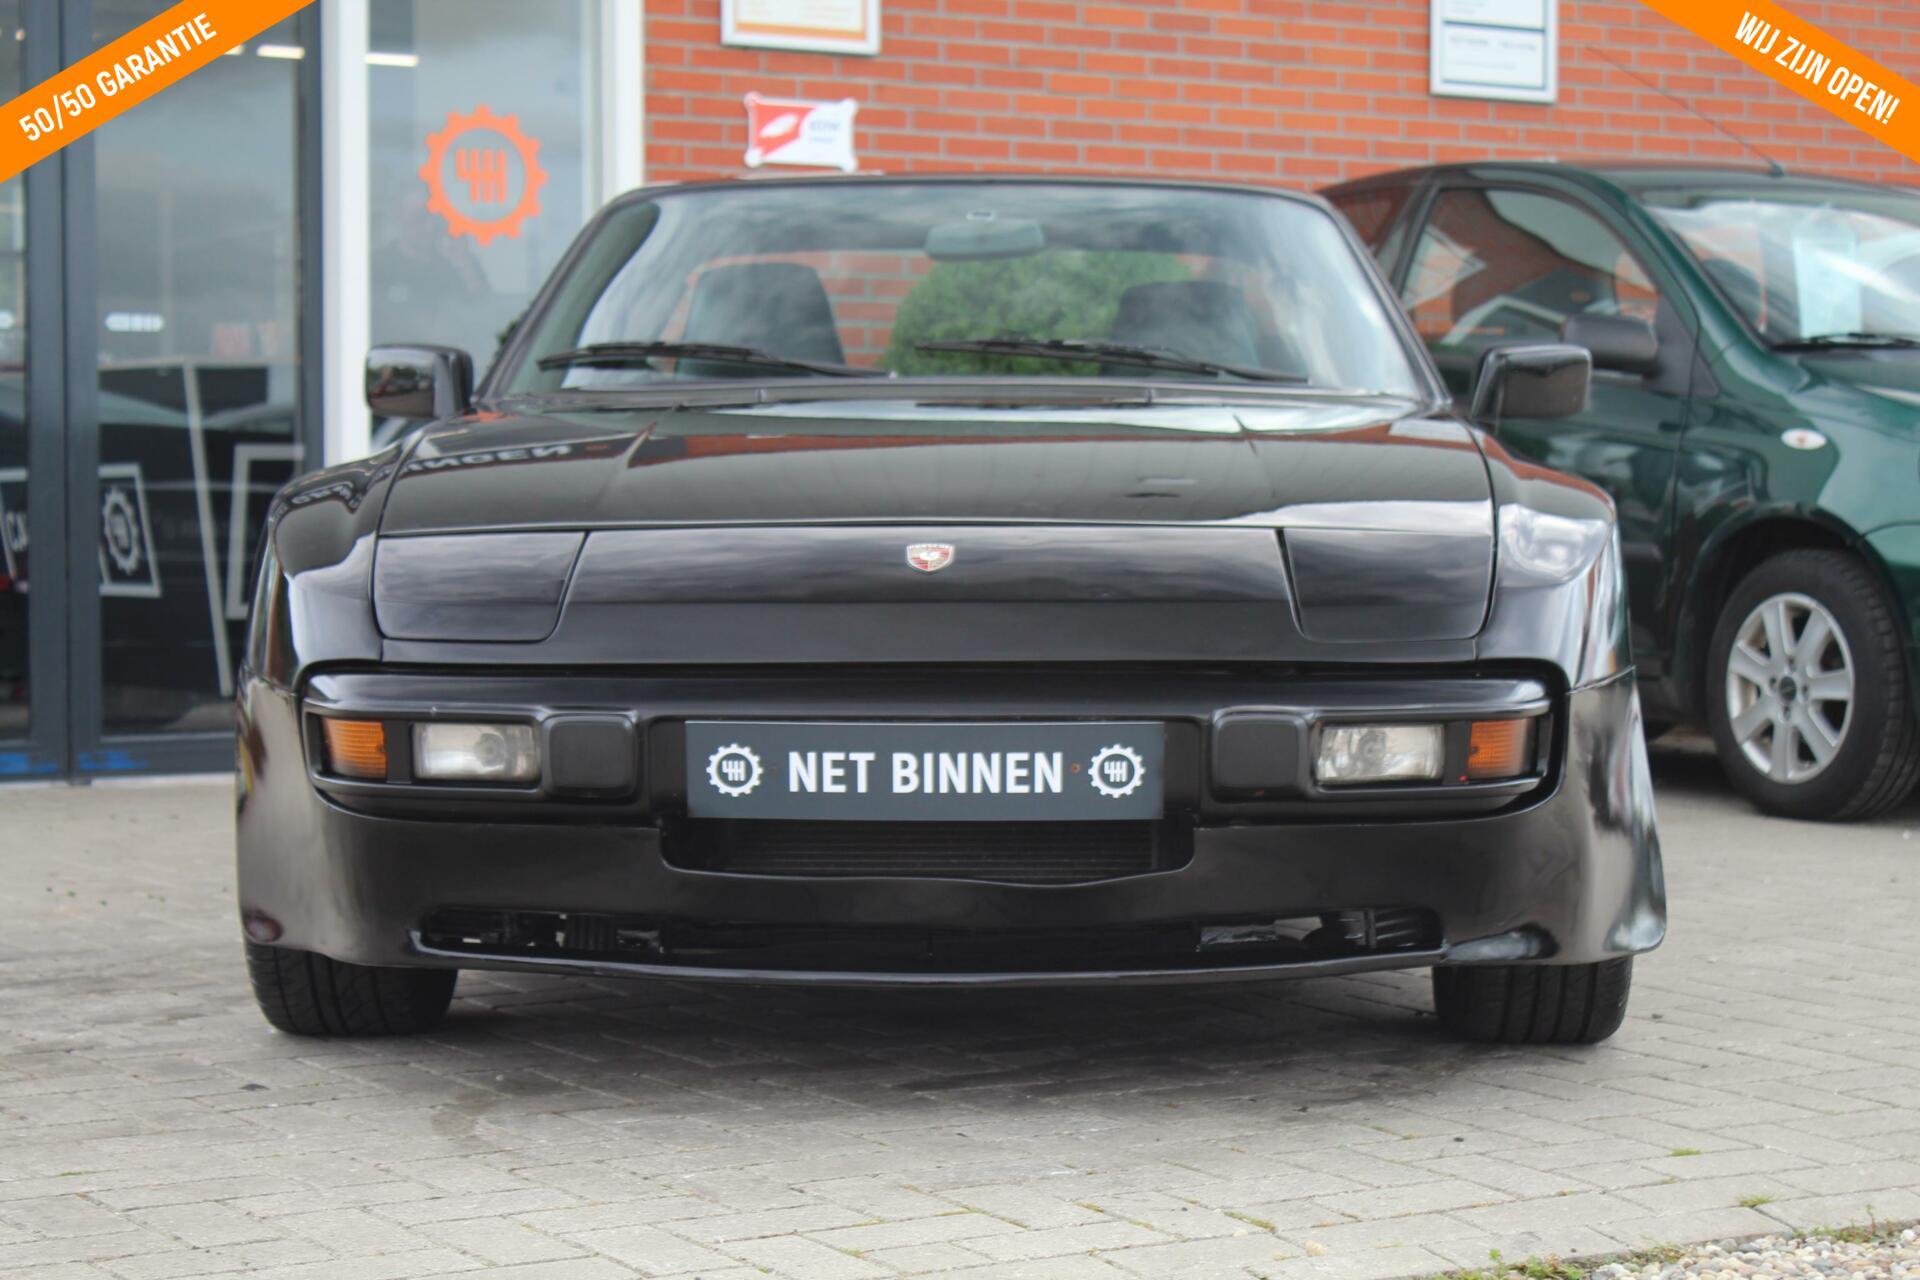 Caroutlet Groningen - Porsche 944 2.5 Turbo (motor) Coupe | ERG SNEL | SCHUURVONDST